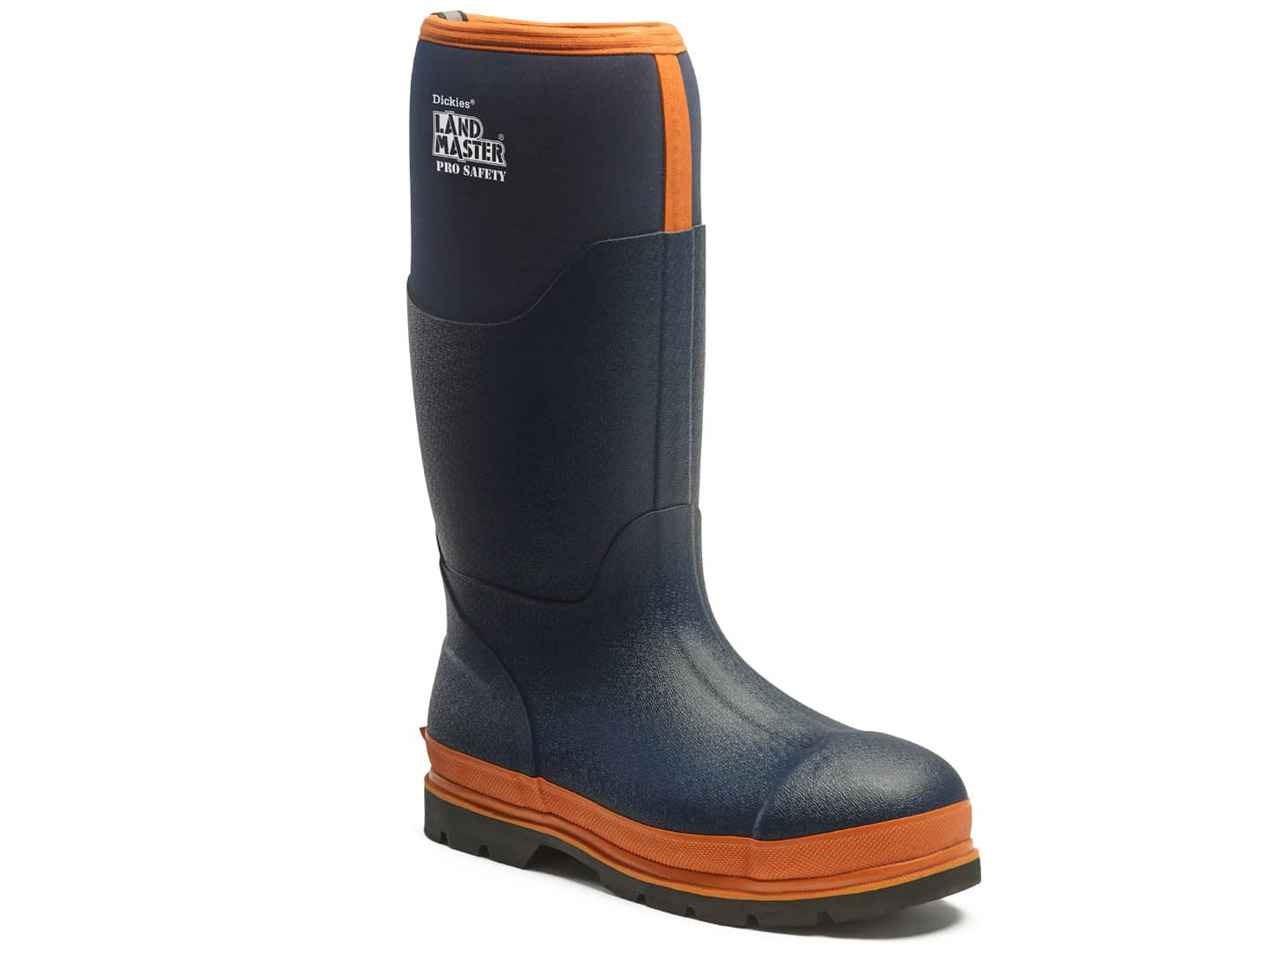 8accd5510a0 Dickies FW9902BO12 Landmaster Pro Safety Wellington Boot Blue/Orange Size 12